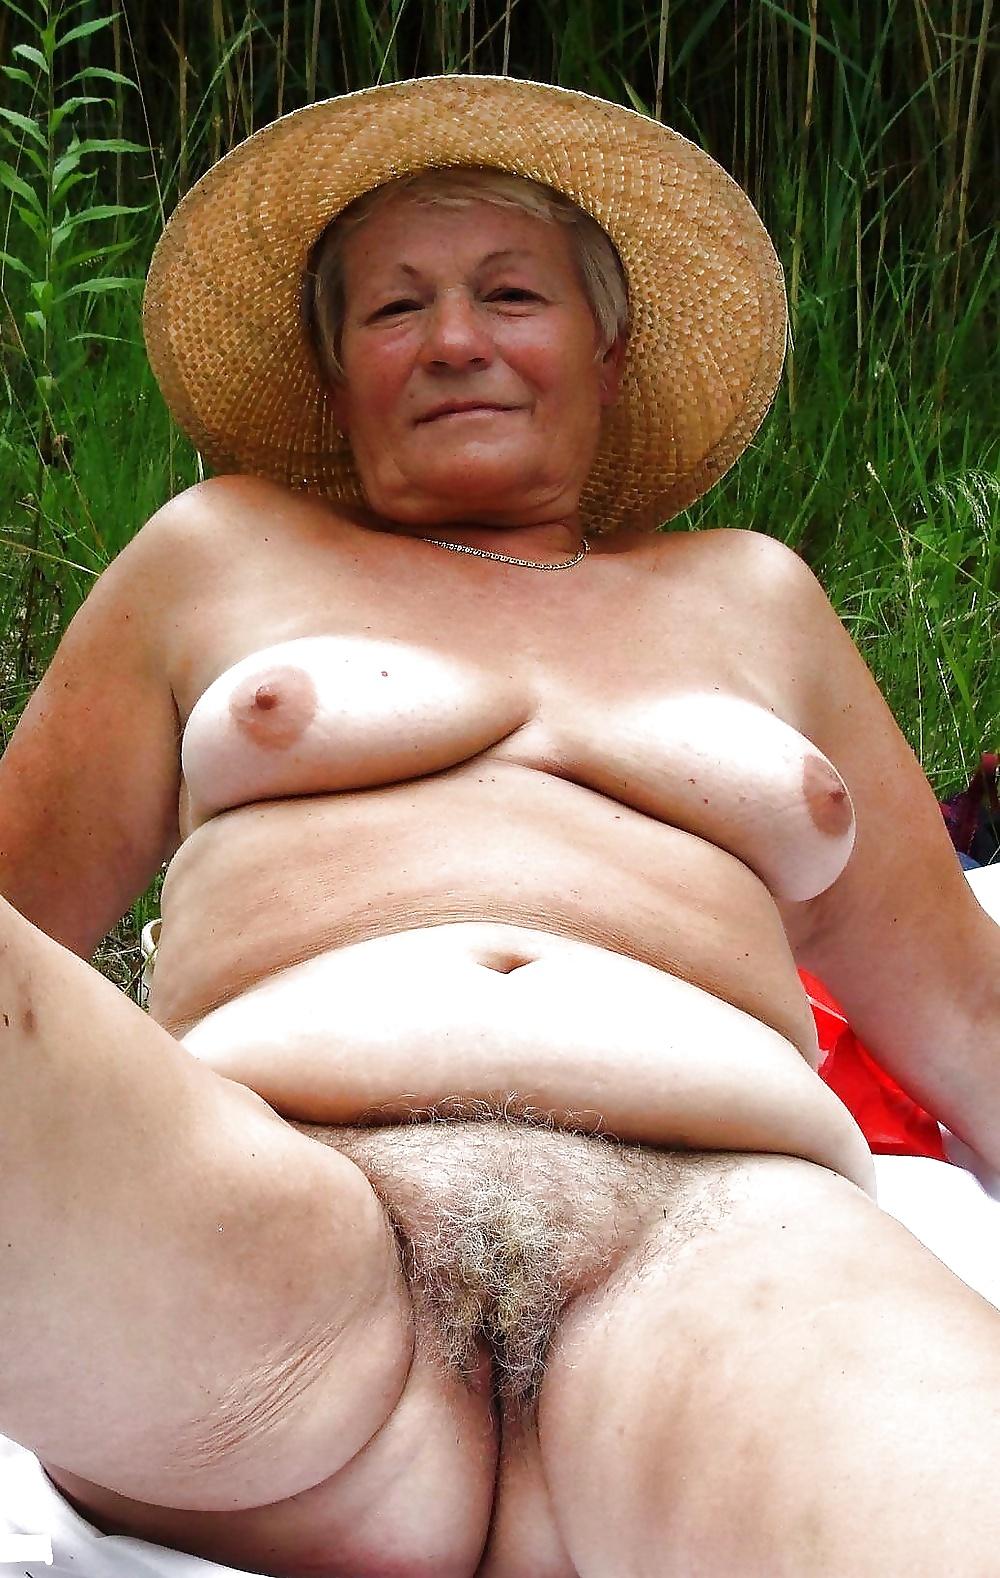 Old granny ripe hairy